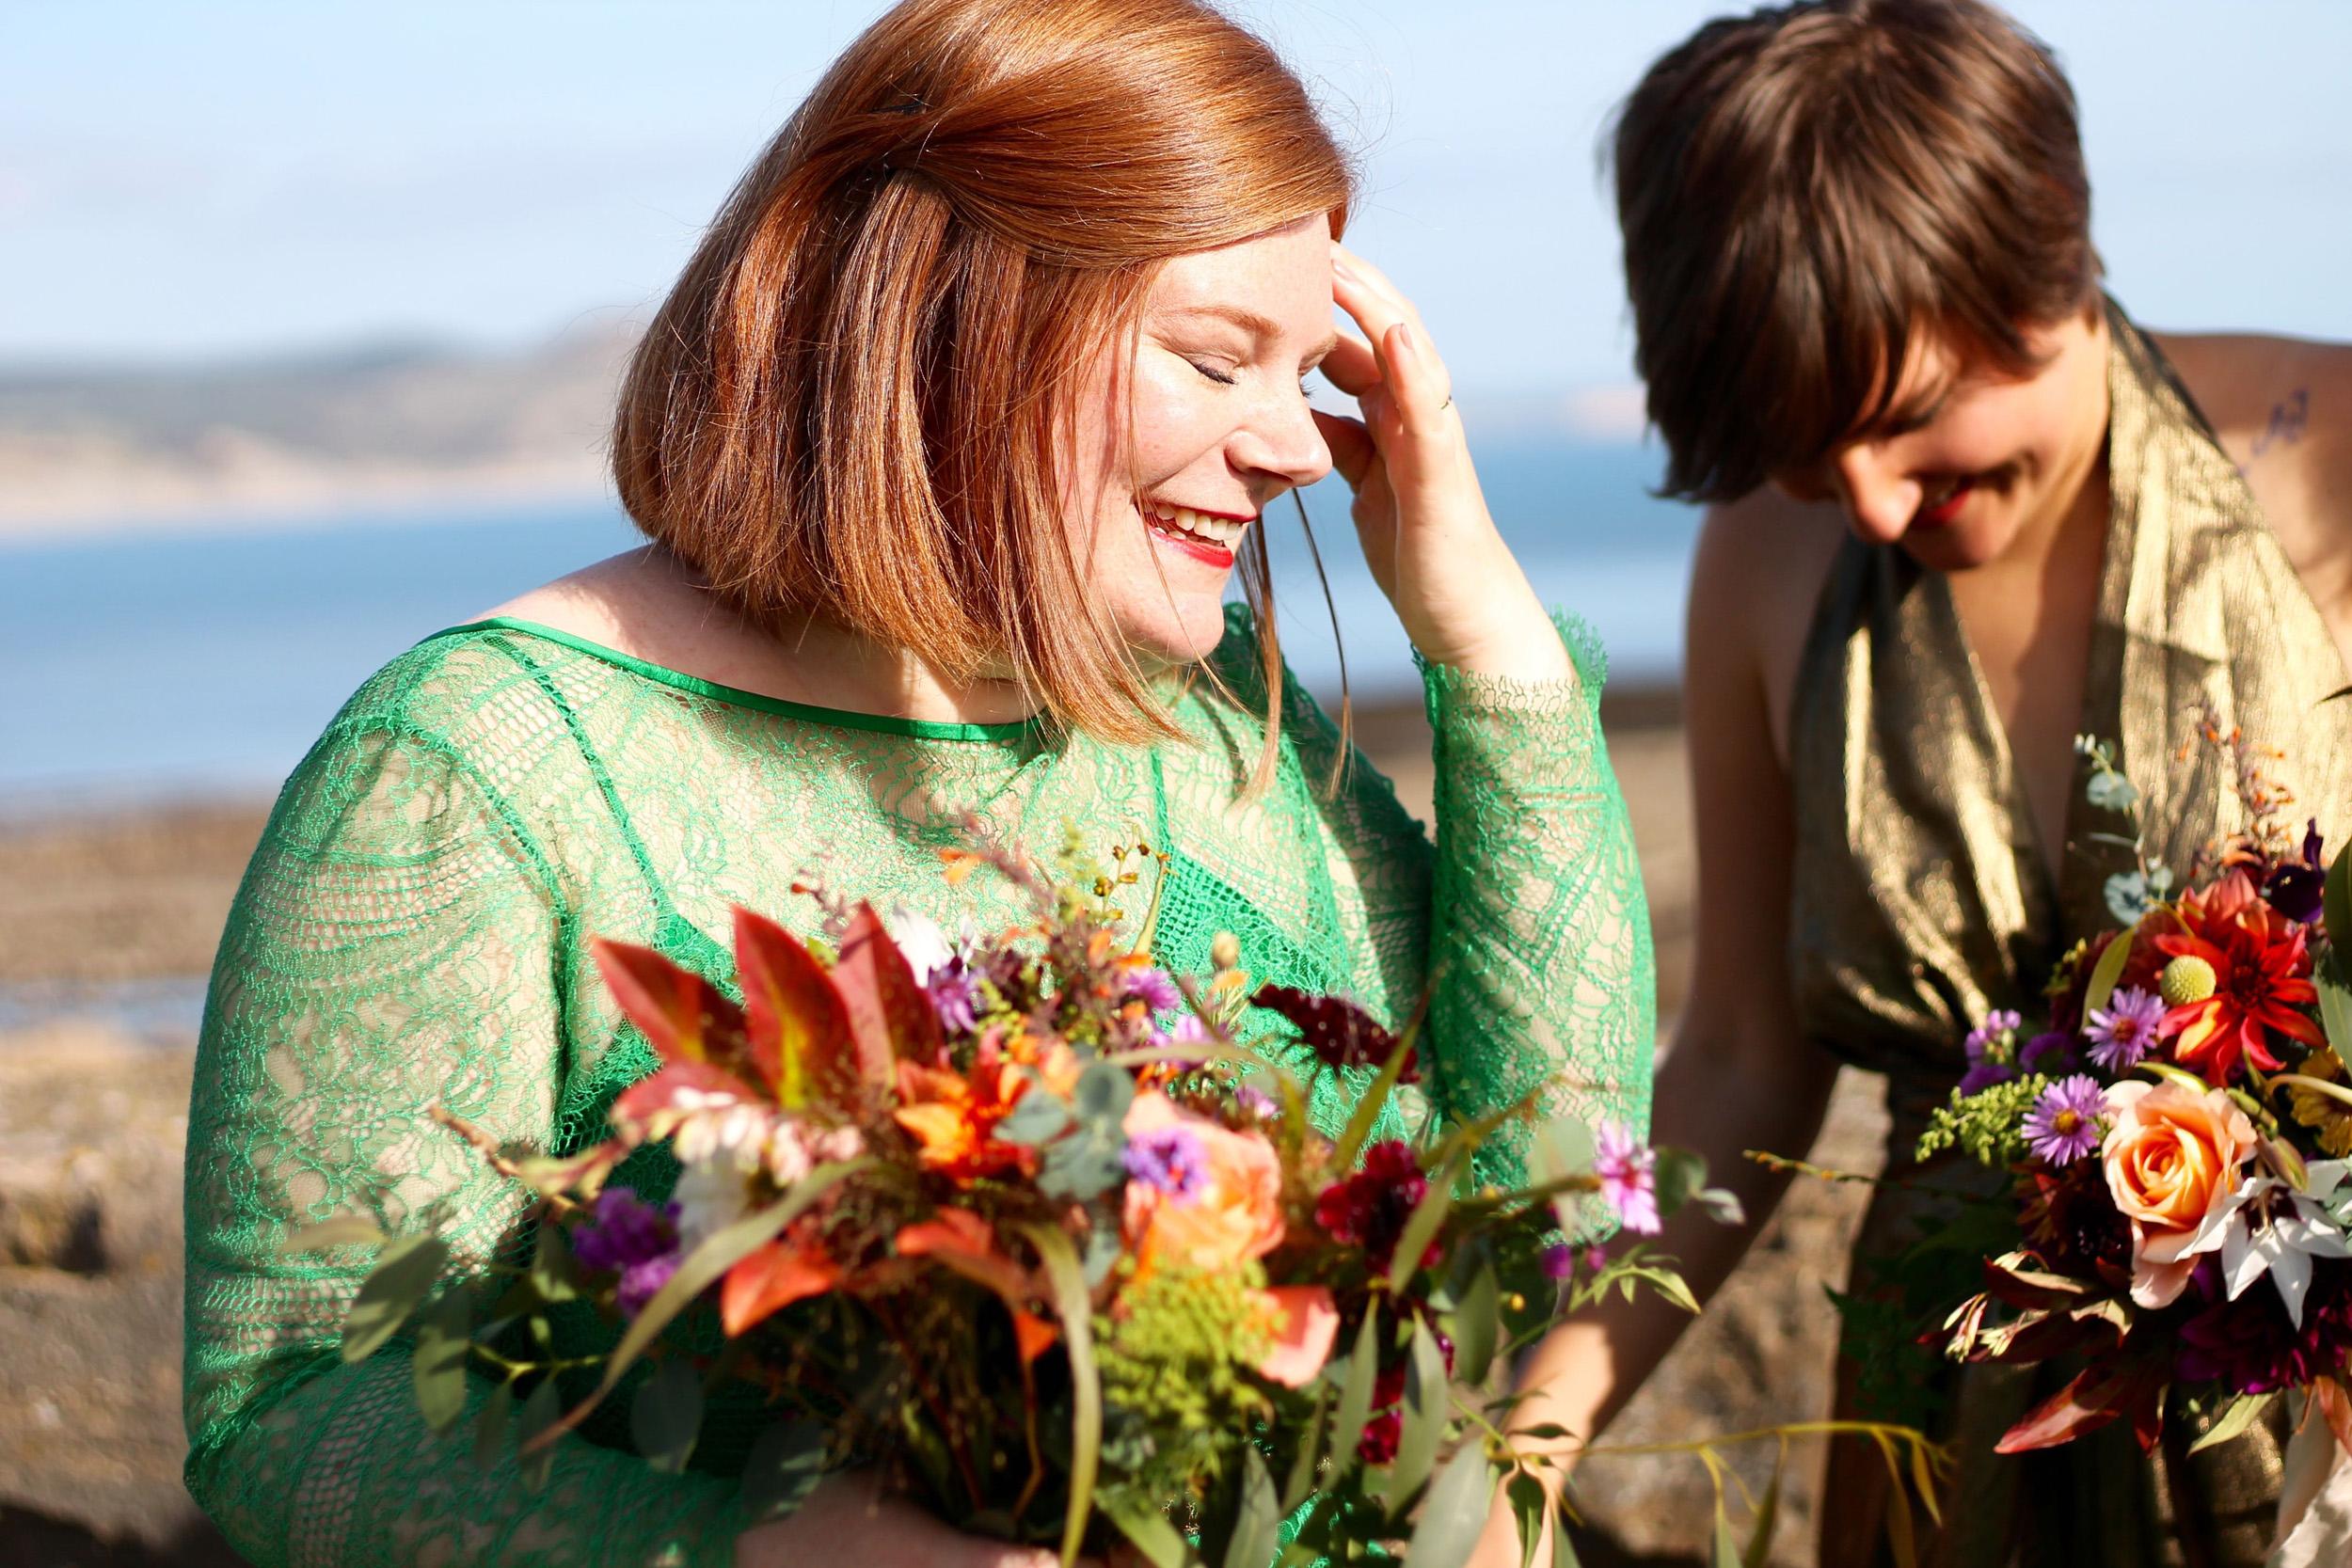 Lucy-Bespoke-Green-Silk-Lace-Wedding-Dress-Kate-Beaumont-Sheffield-a-3.jpg